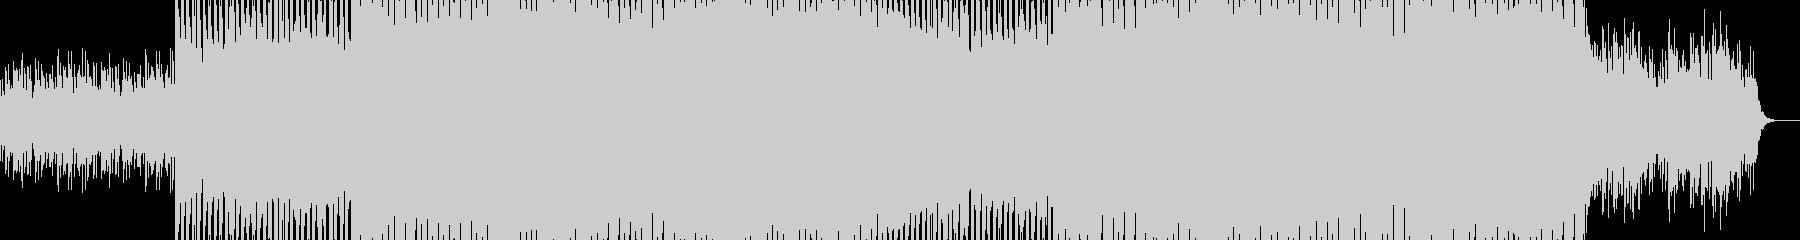 EDMポップで明るいクラブ系-88の未再生の波形